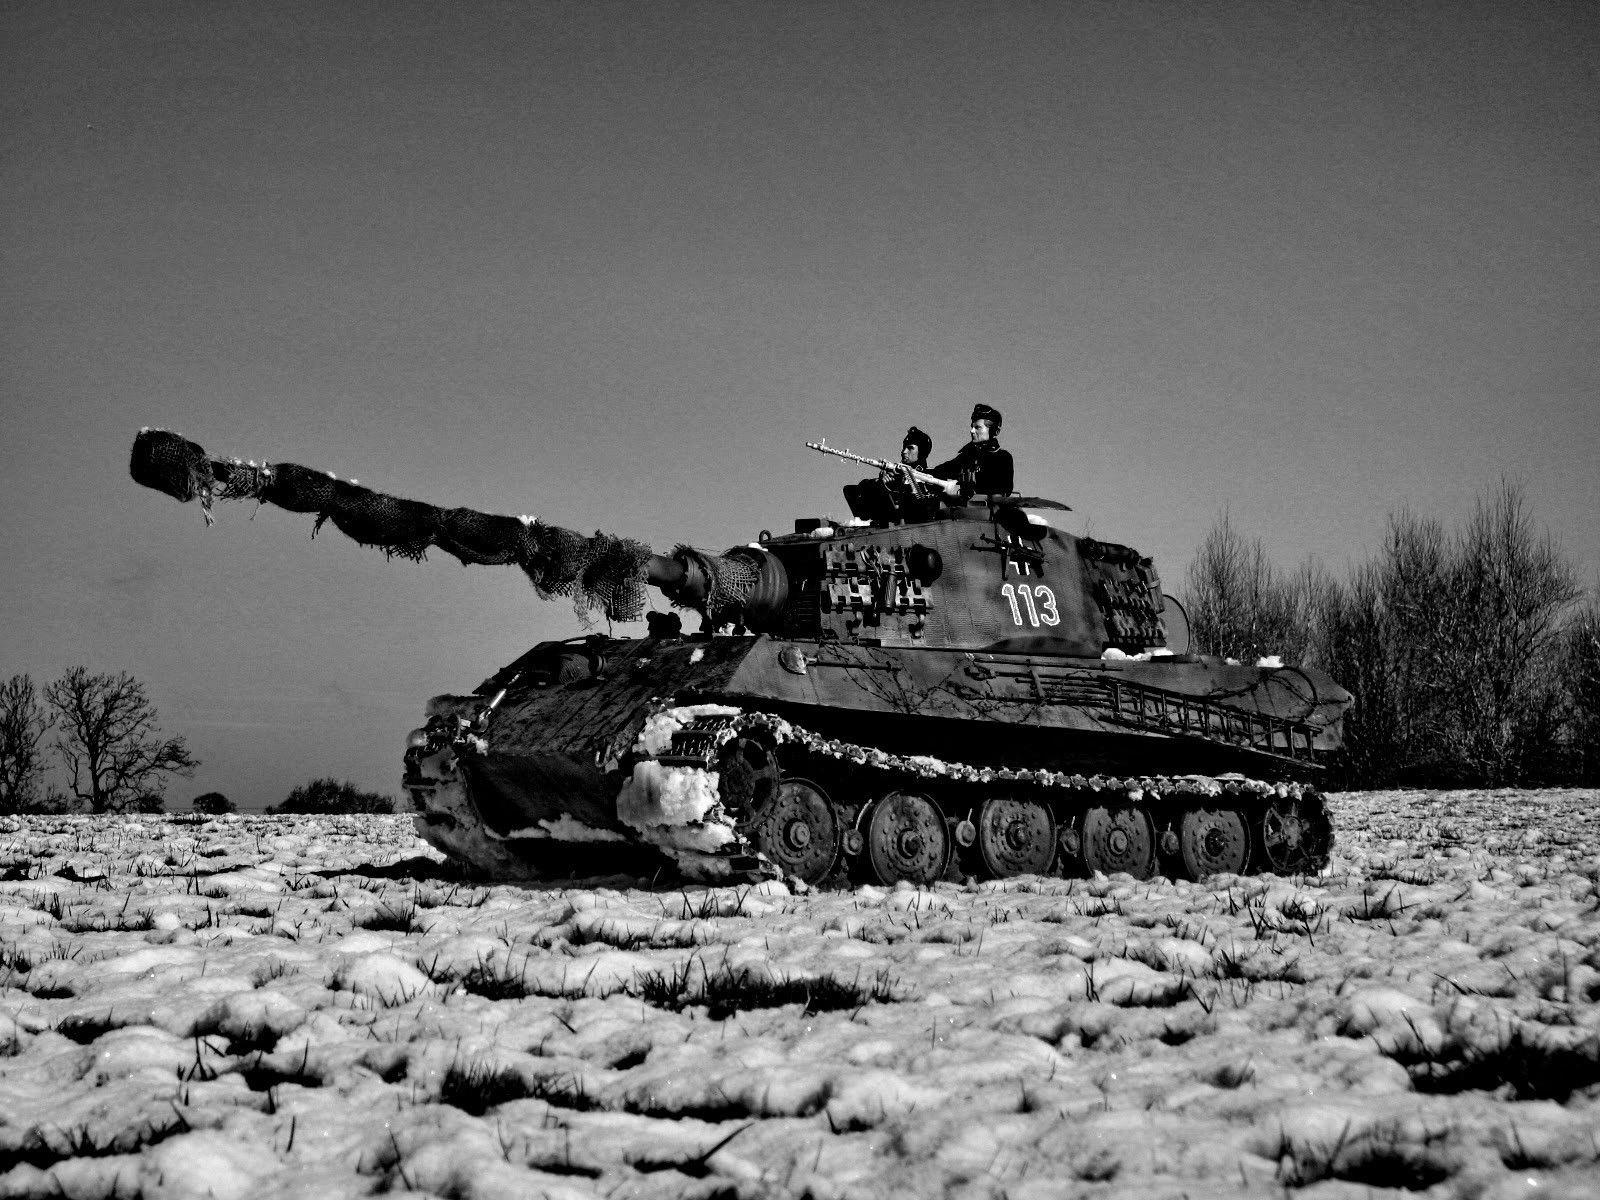 Germany tiger tanks wermacht world war ii black white grayscale guns germany tiger tanks wermacht world war ii black white grayscale guns snow wallpapers widescreen altavistaventures Image collections